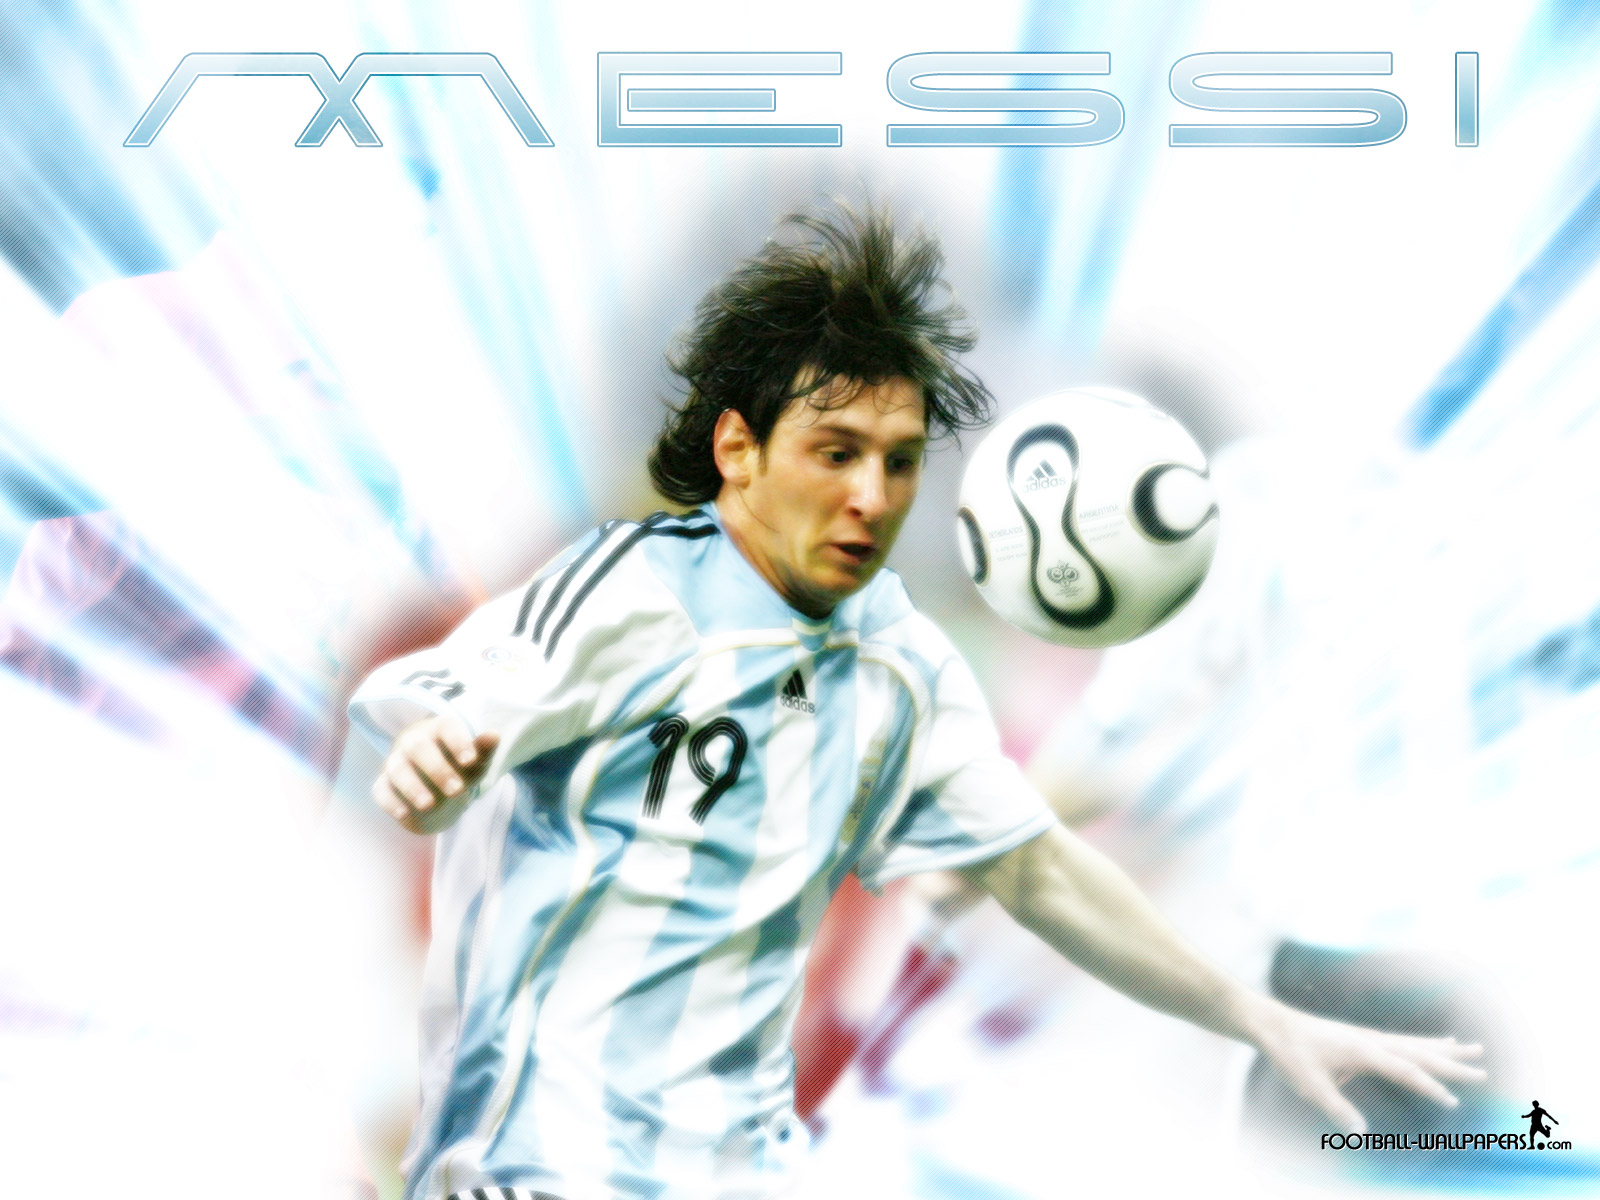 diego maradona playing style - photo #46